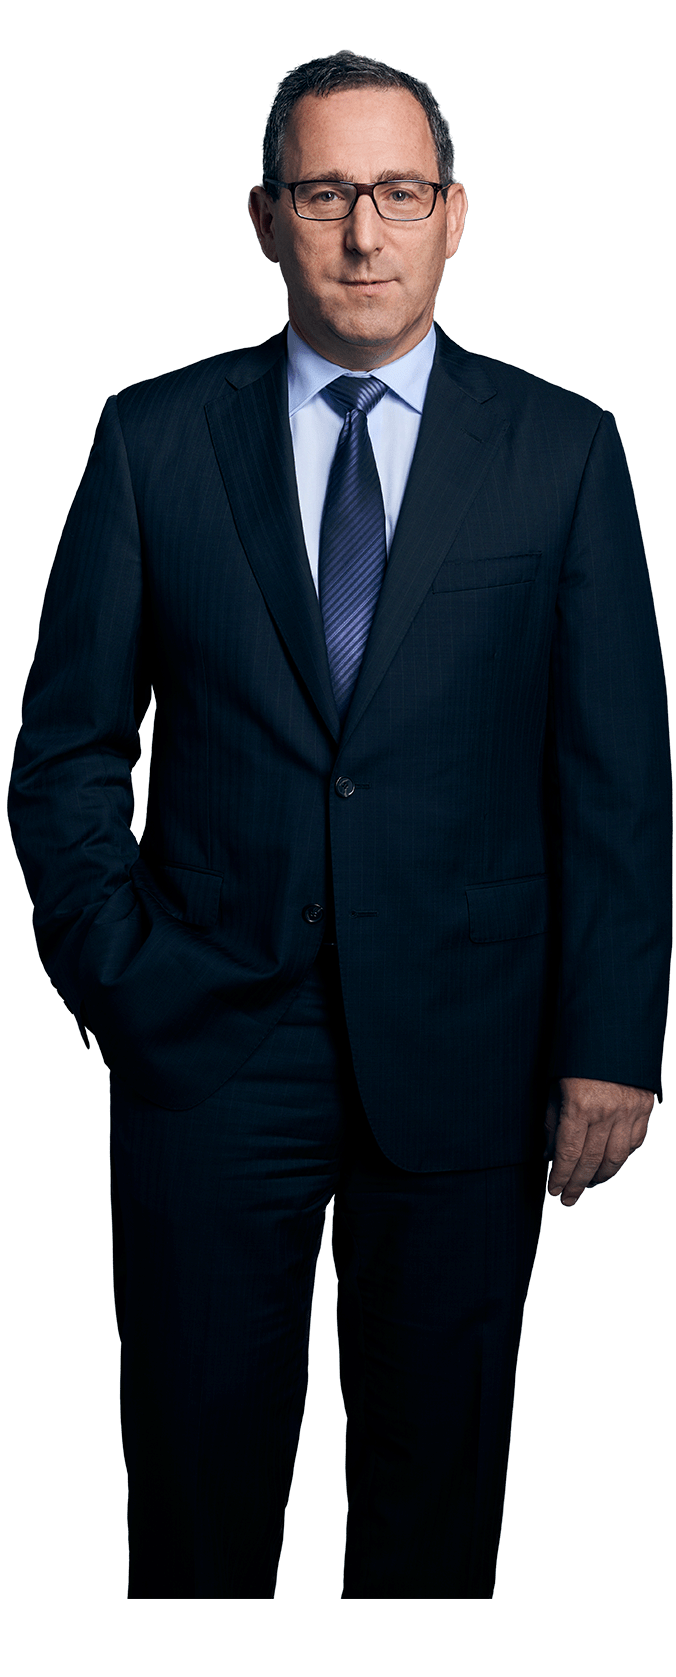 Leon Krantzberg